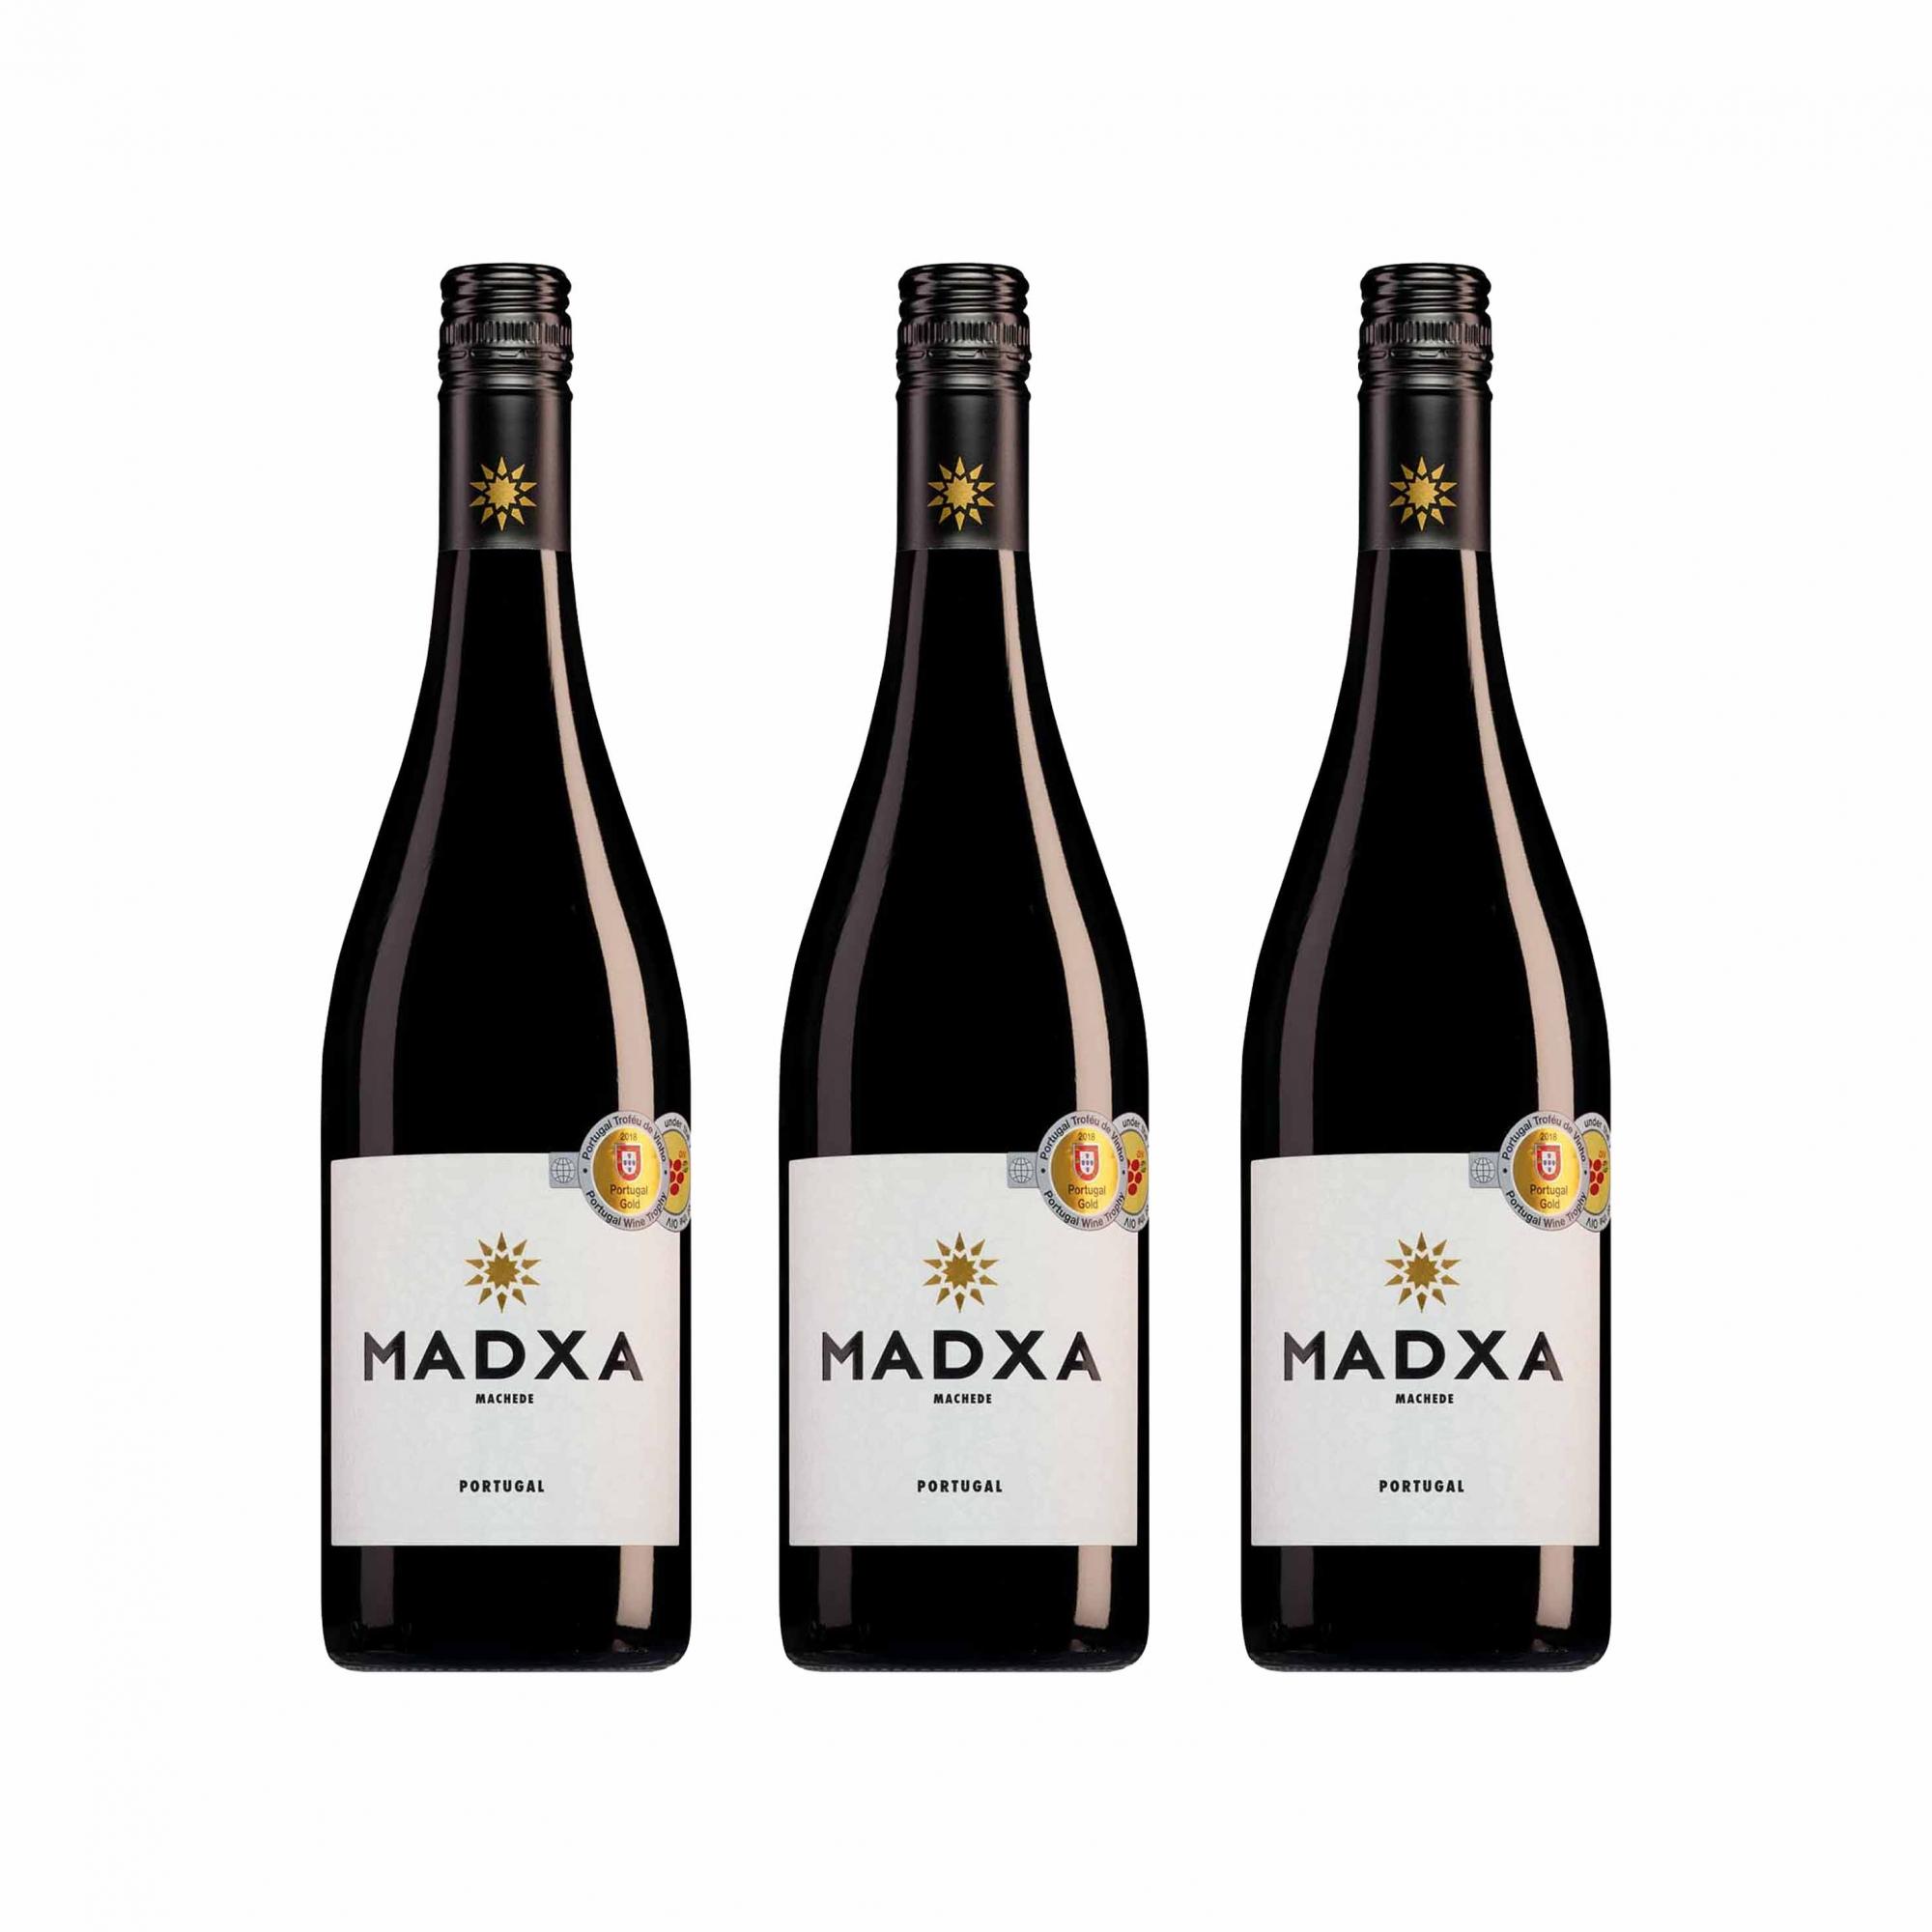 Kit 3x Vinho Tinto Português Casa Relvas Madxa 2018